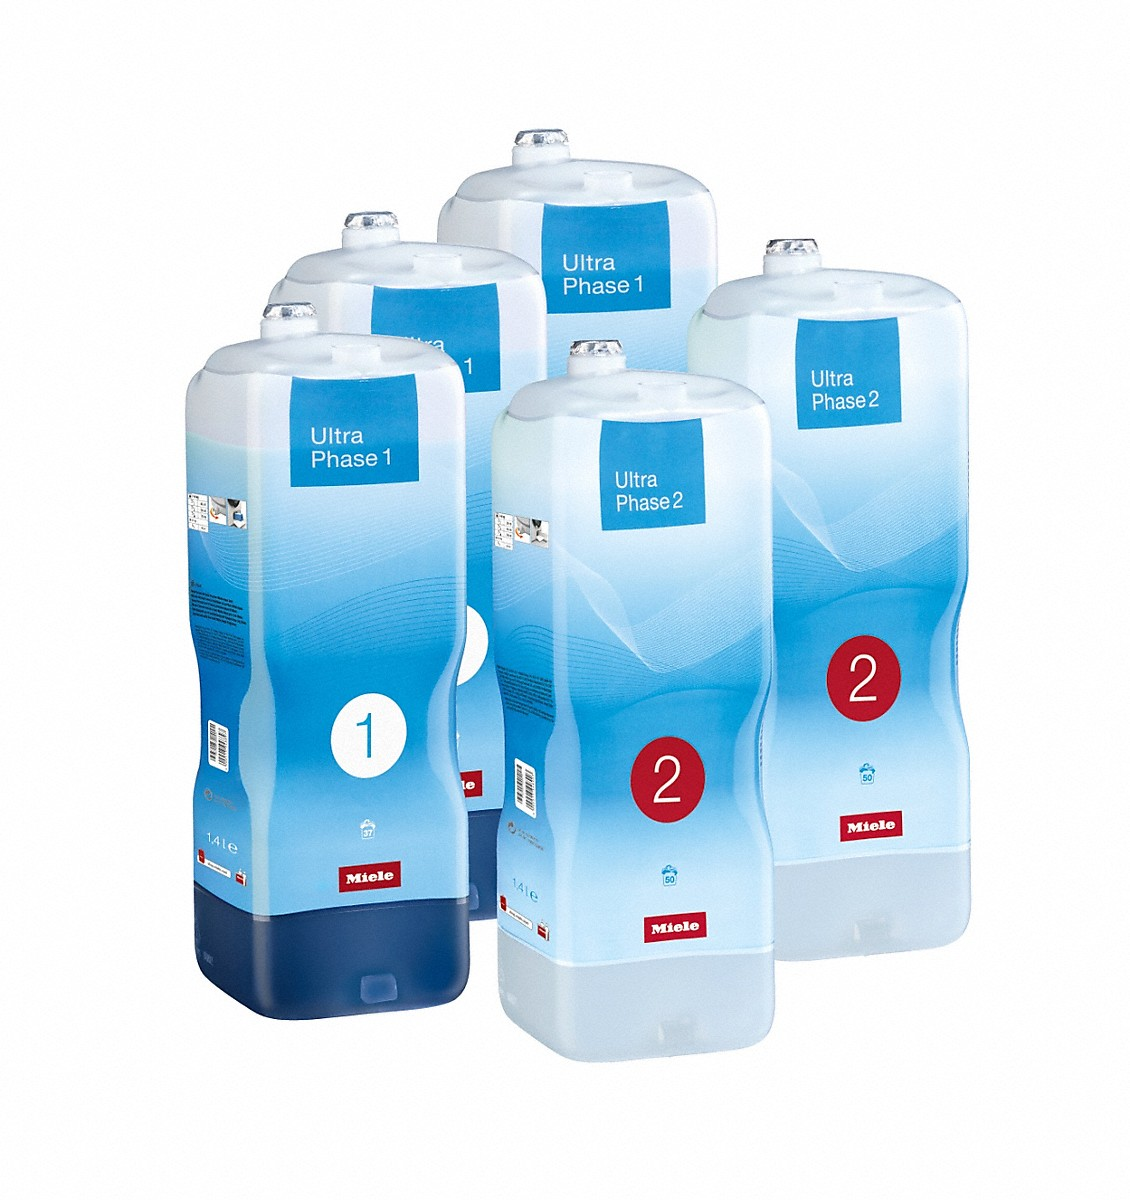 Vouchere Pachet cadou detergent  UltraPhase pentru 6 luni